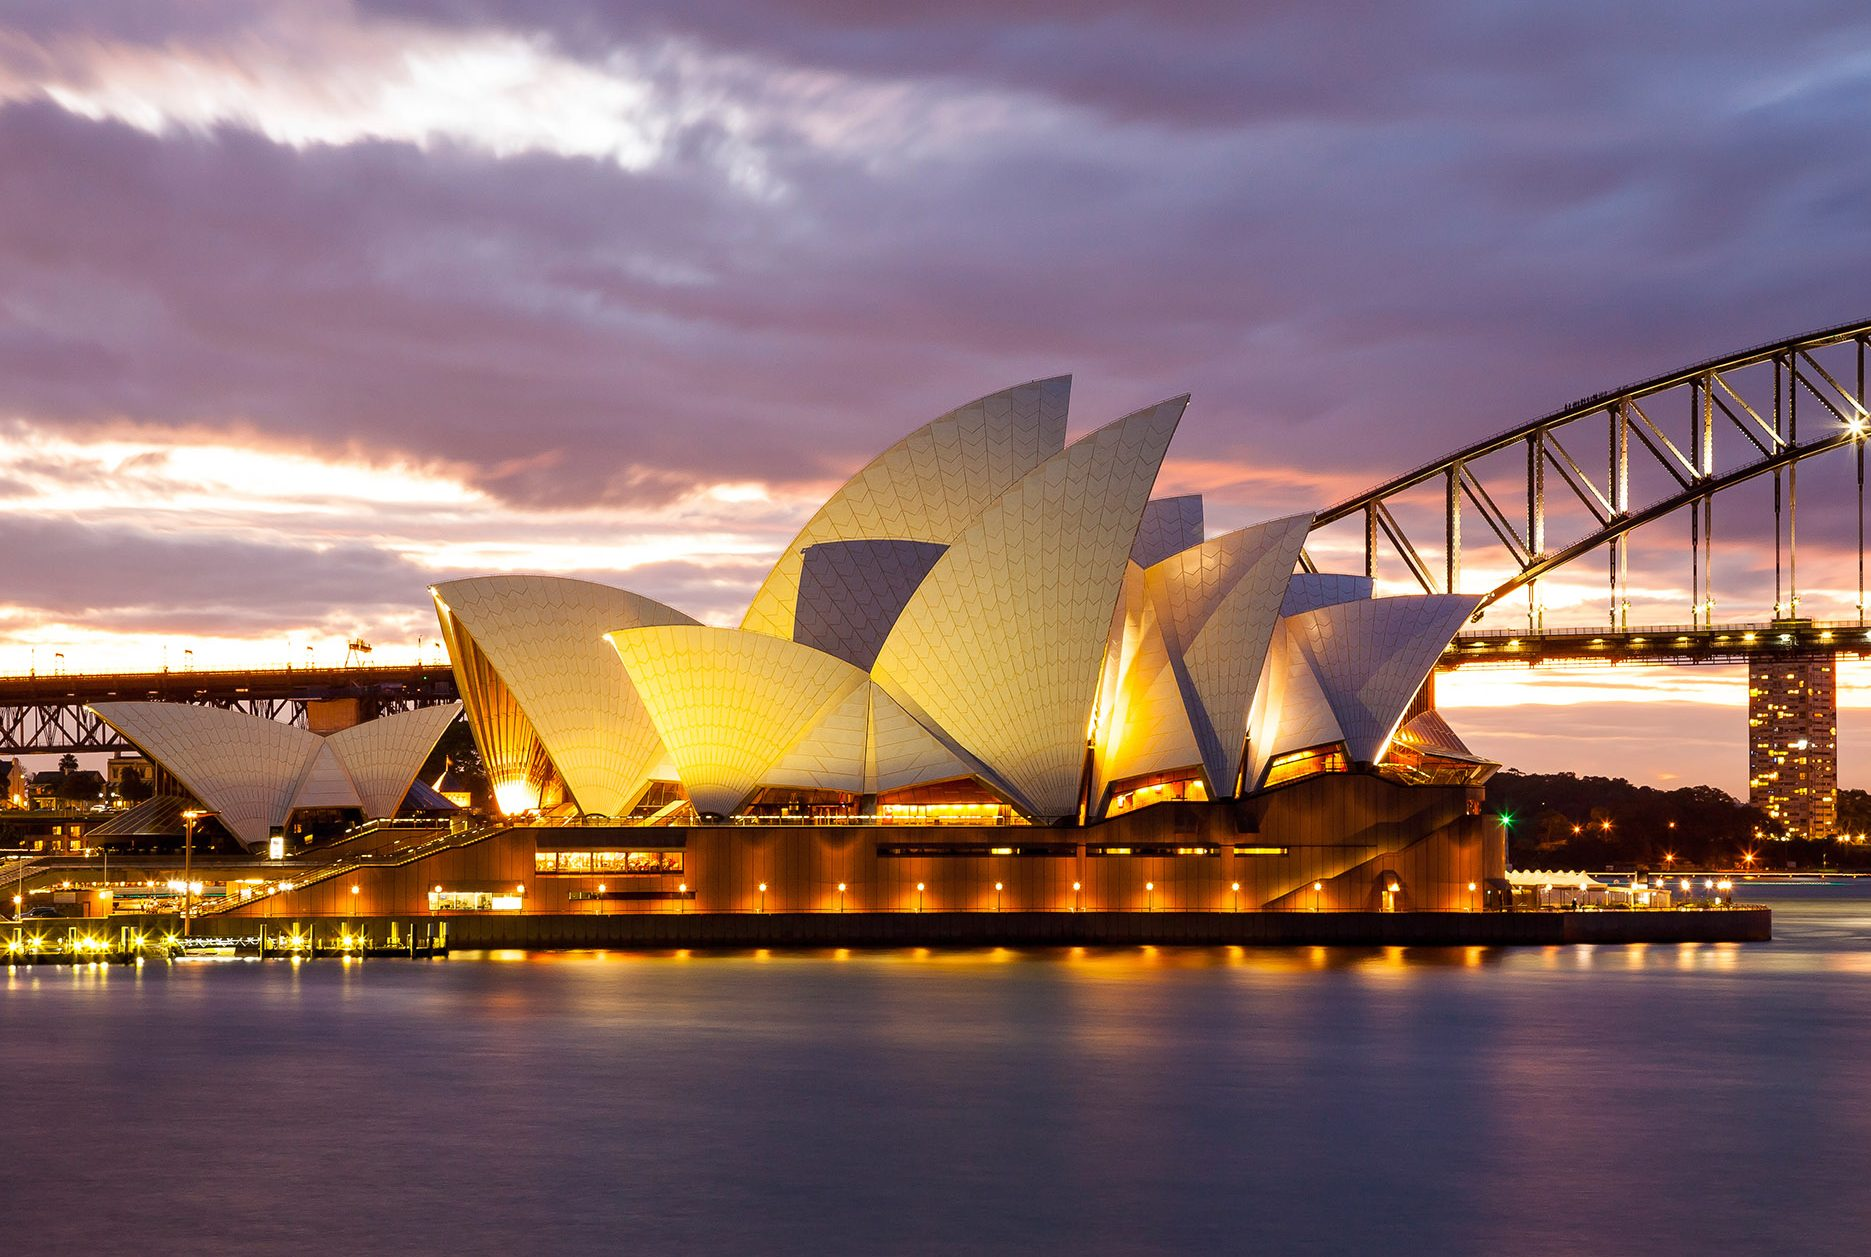 Sydney Opera House and Harbour Bridge at Dusk, Australia бесплатно